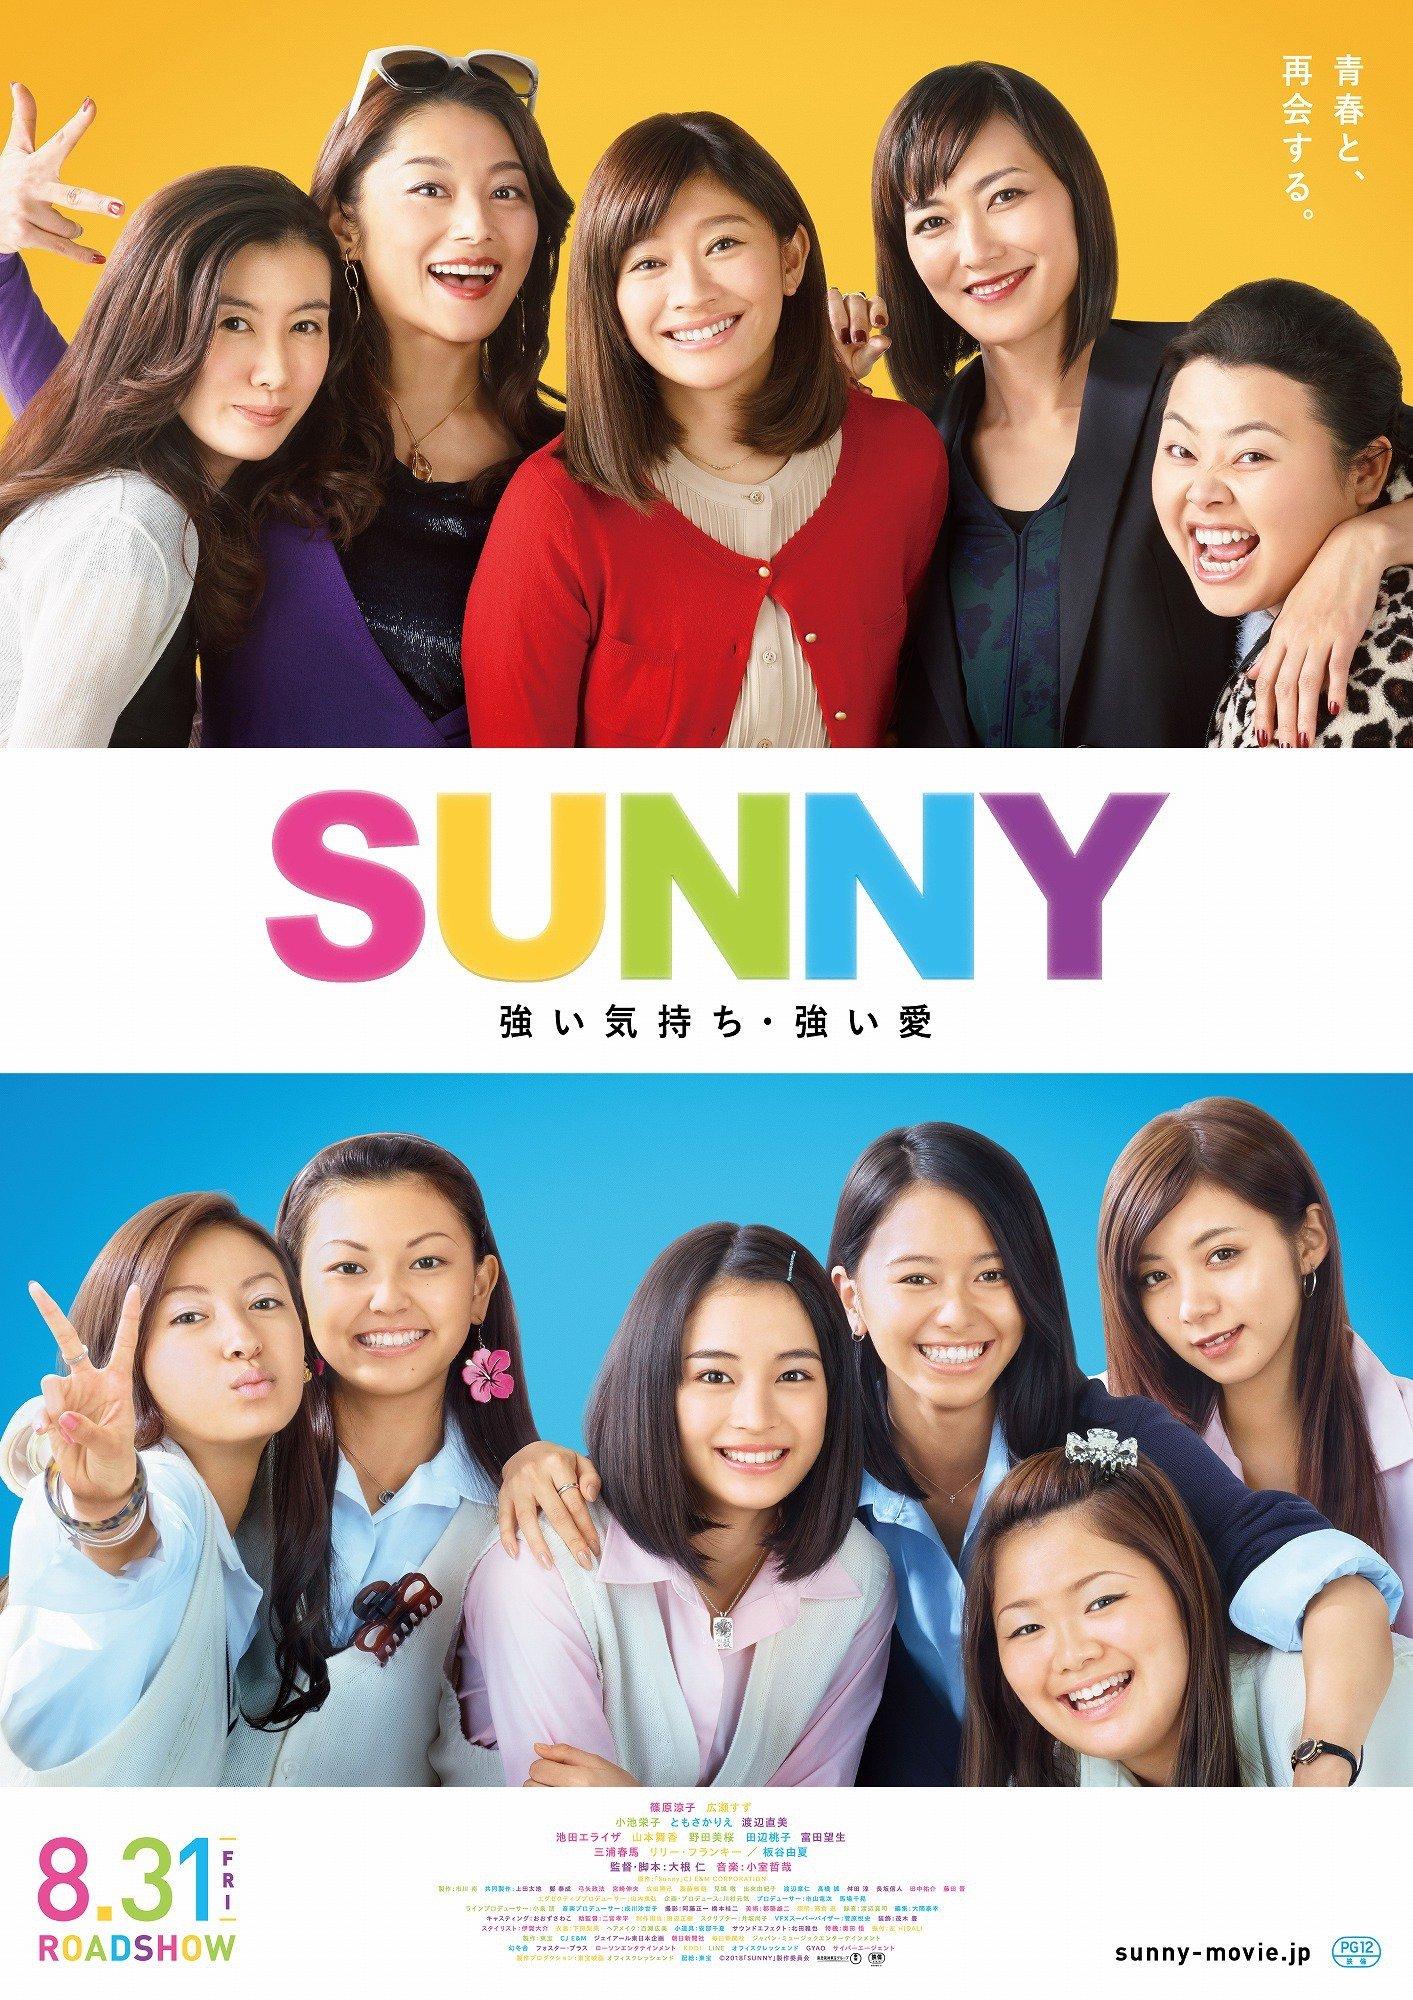 Sunny Our Hearts Beat Together (2018) วันนั้น วันนี้ เพื่อนกันตลอดไป